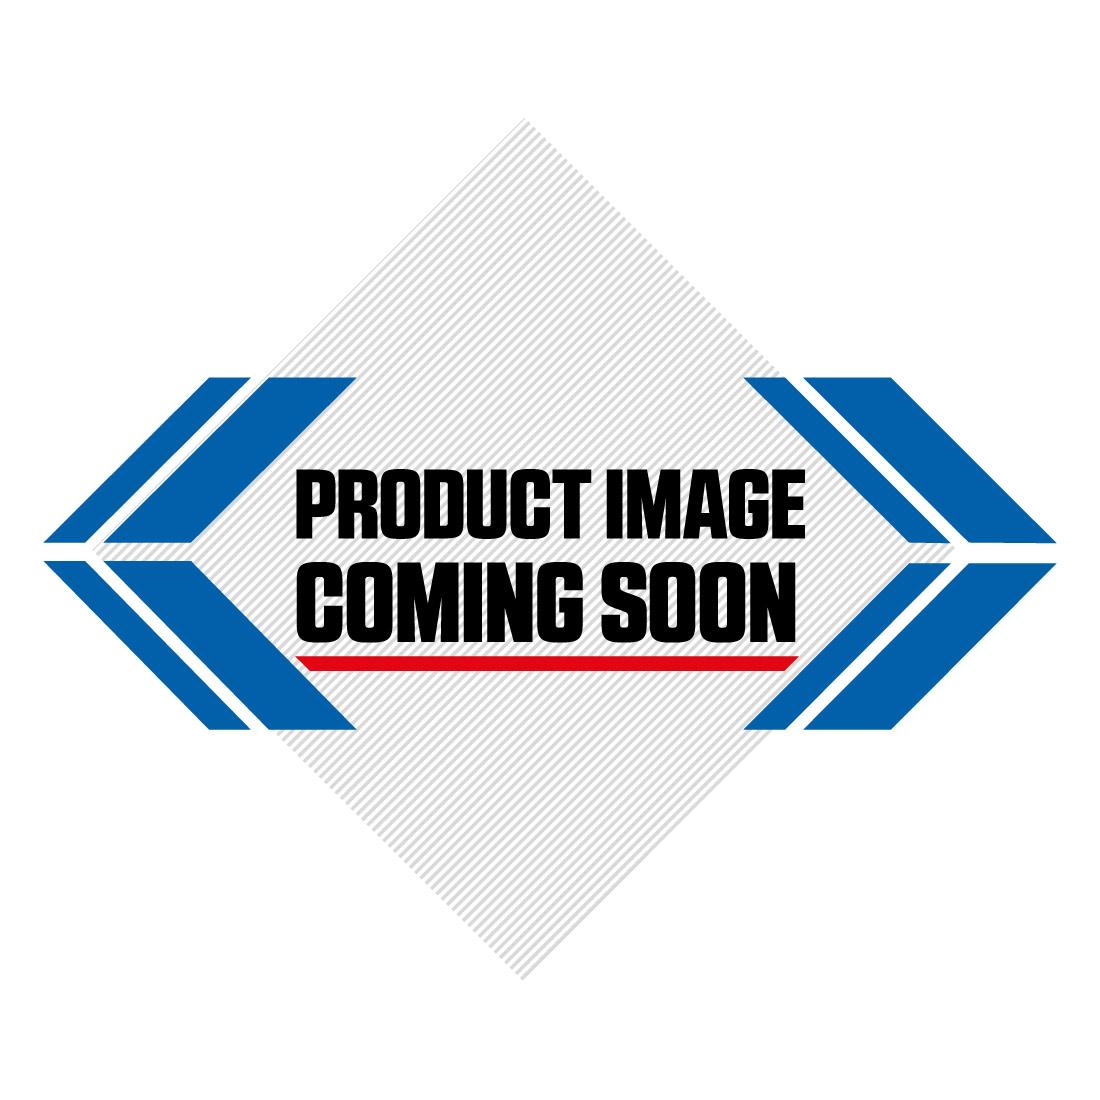 Suzuki Plastic Kit RMZ 450 (2013) OEM Factory Image-3>